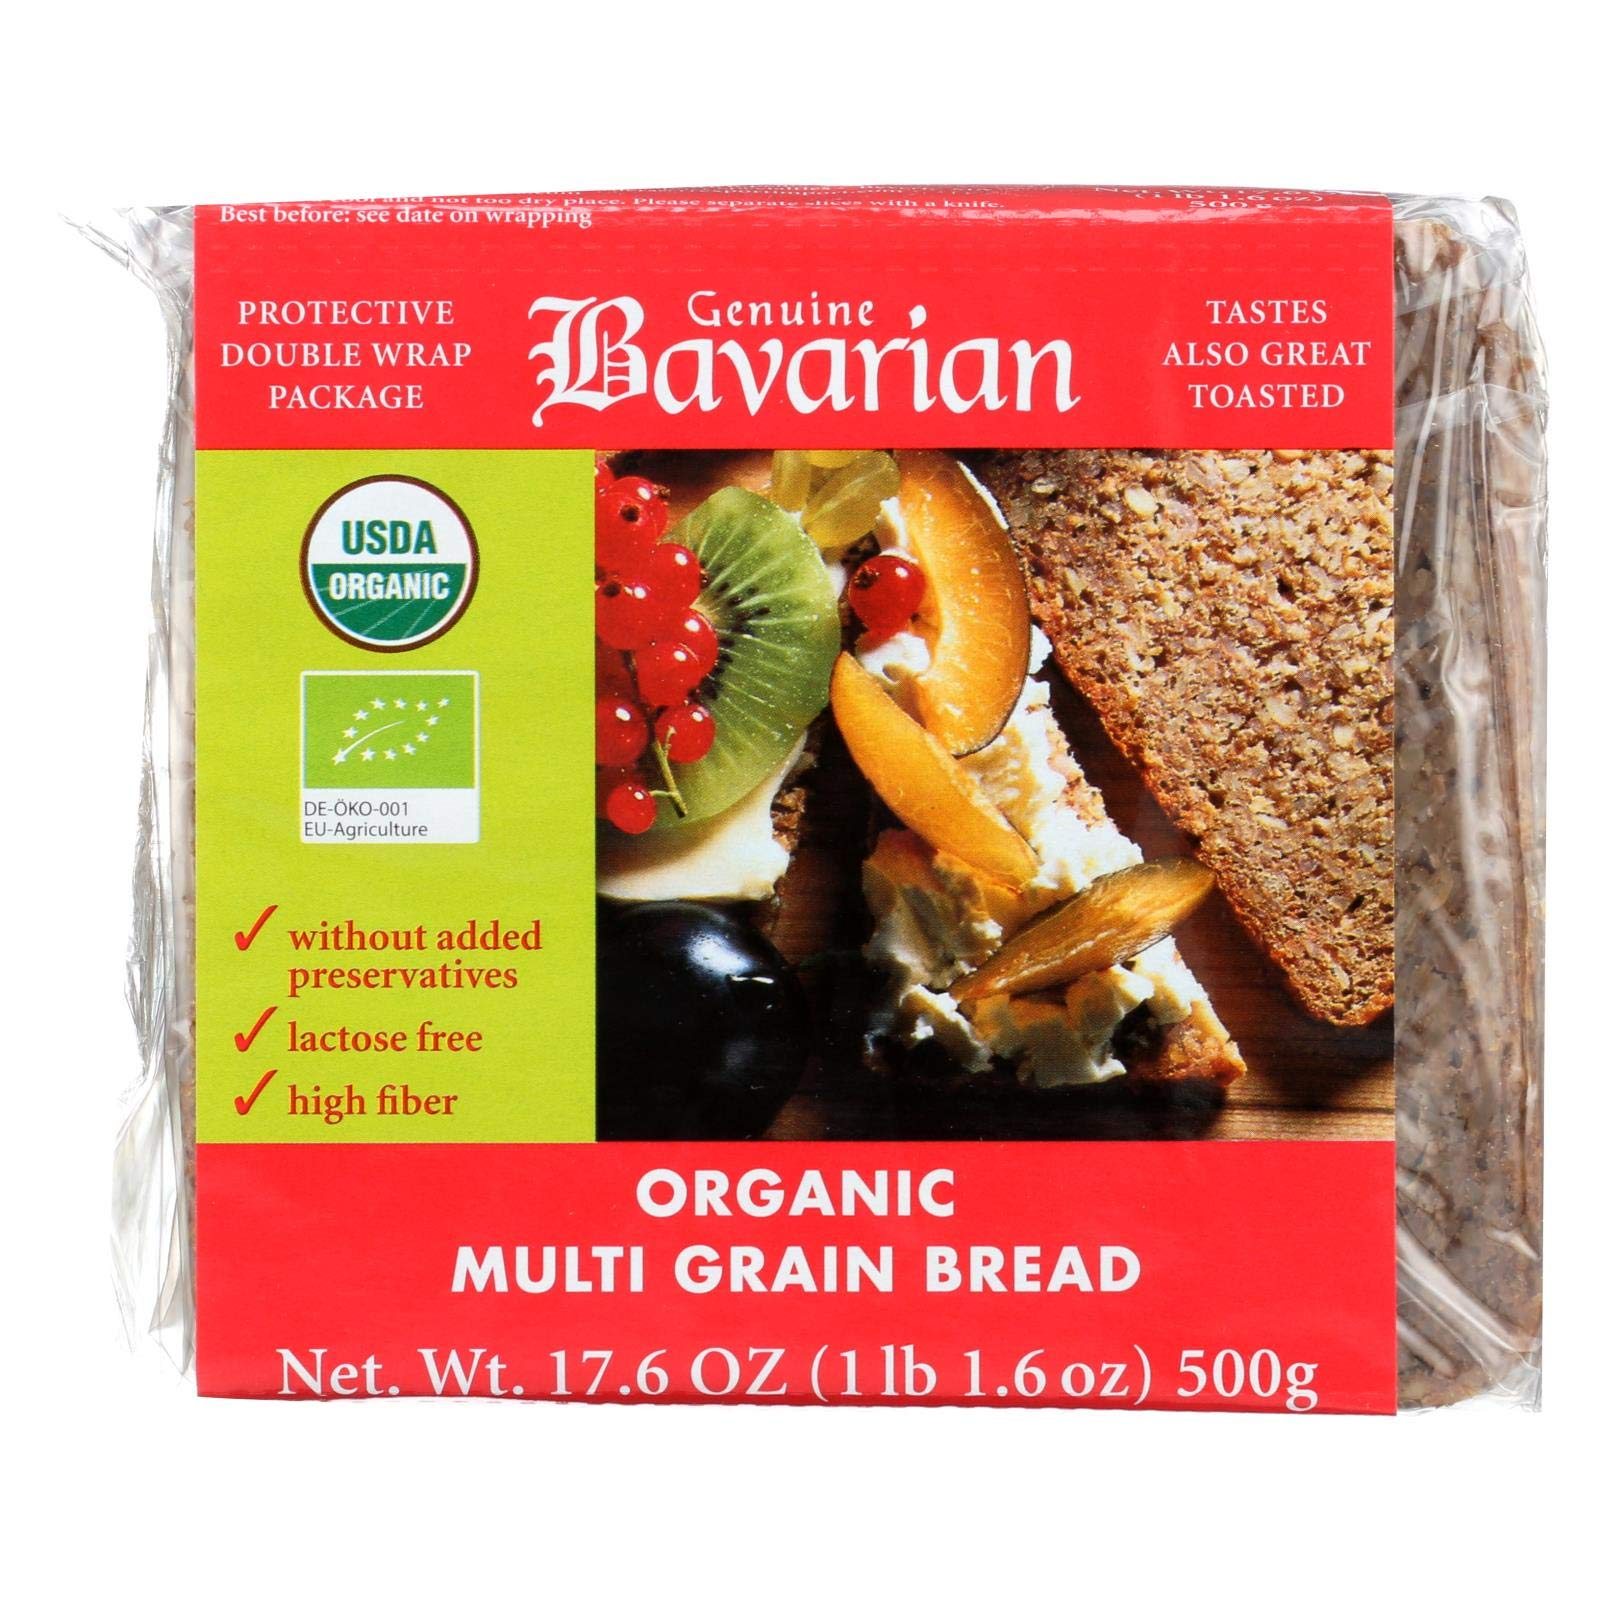 Genuine Bavarian Breads Rye - Multigrain - Case of 6 - 17.6 oz.